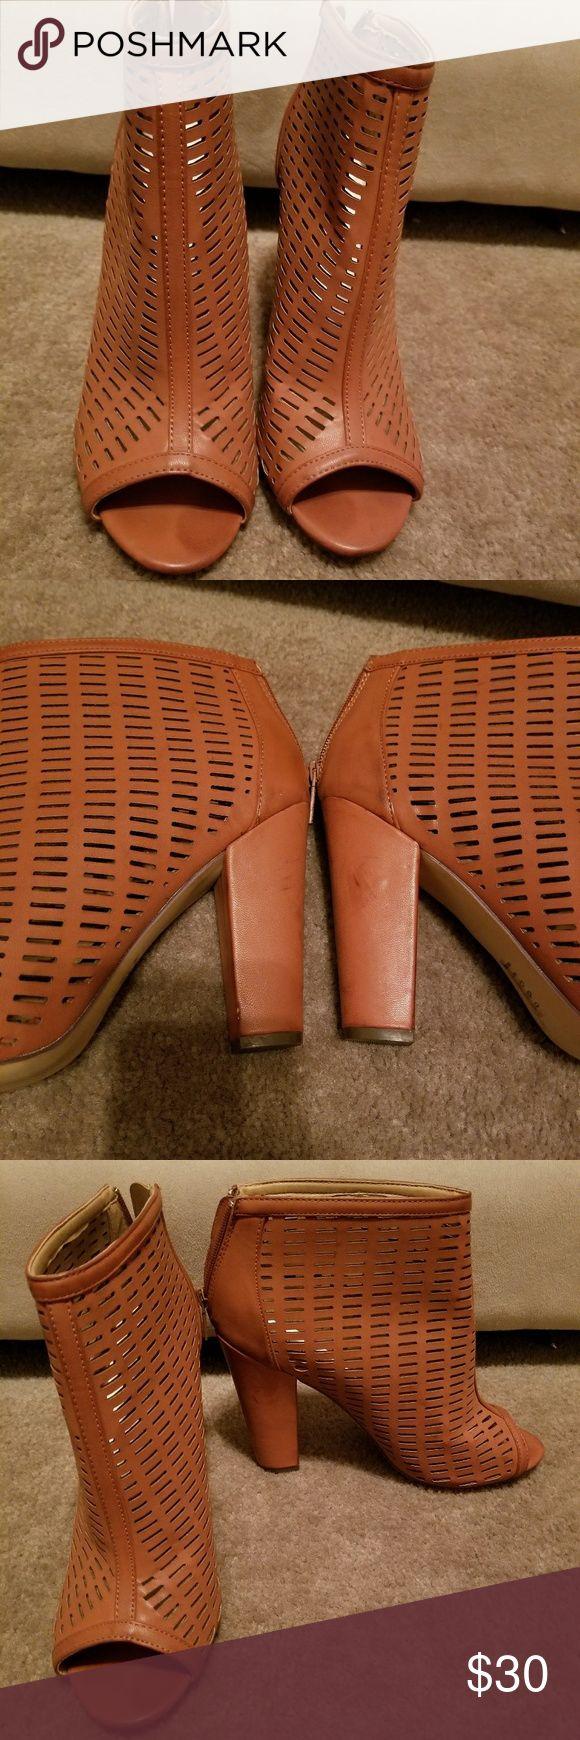 Brown open toe shooties. Brown ankle open toe shooties with zipper in the back Shoes Heels